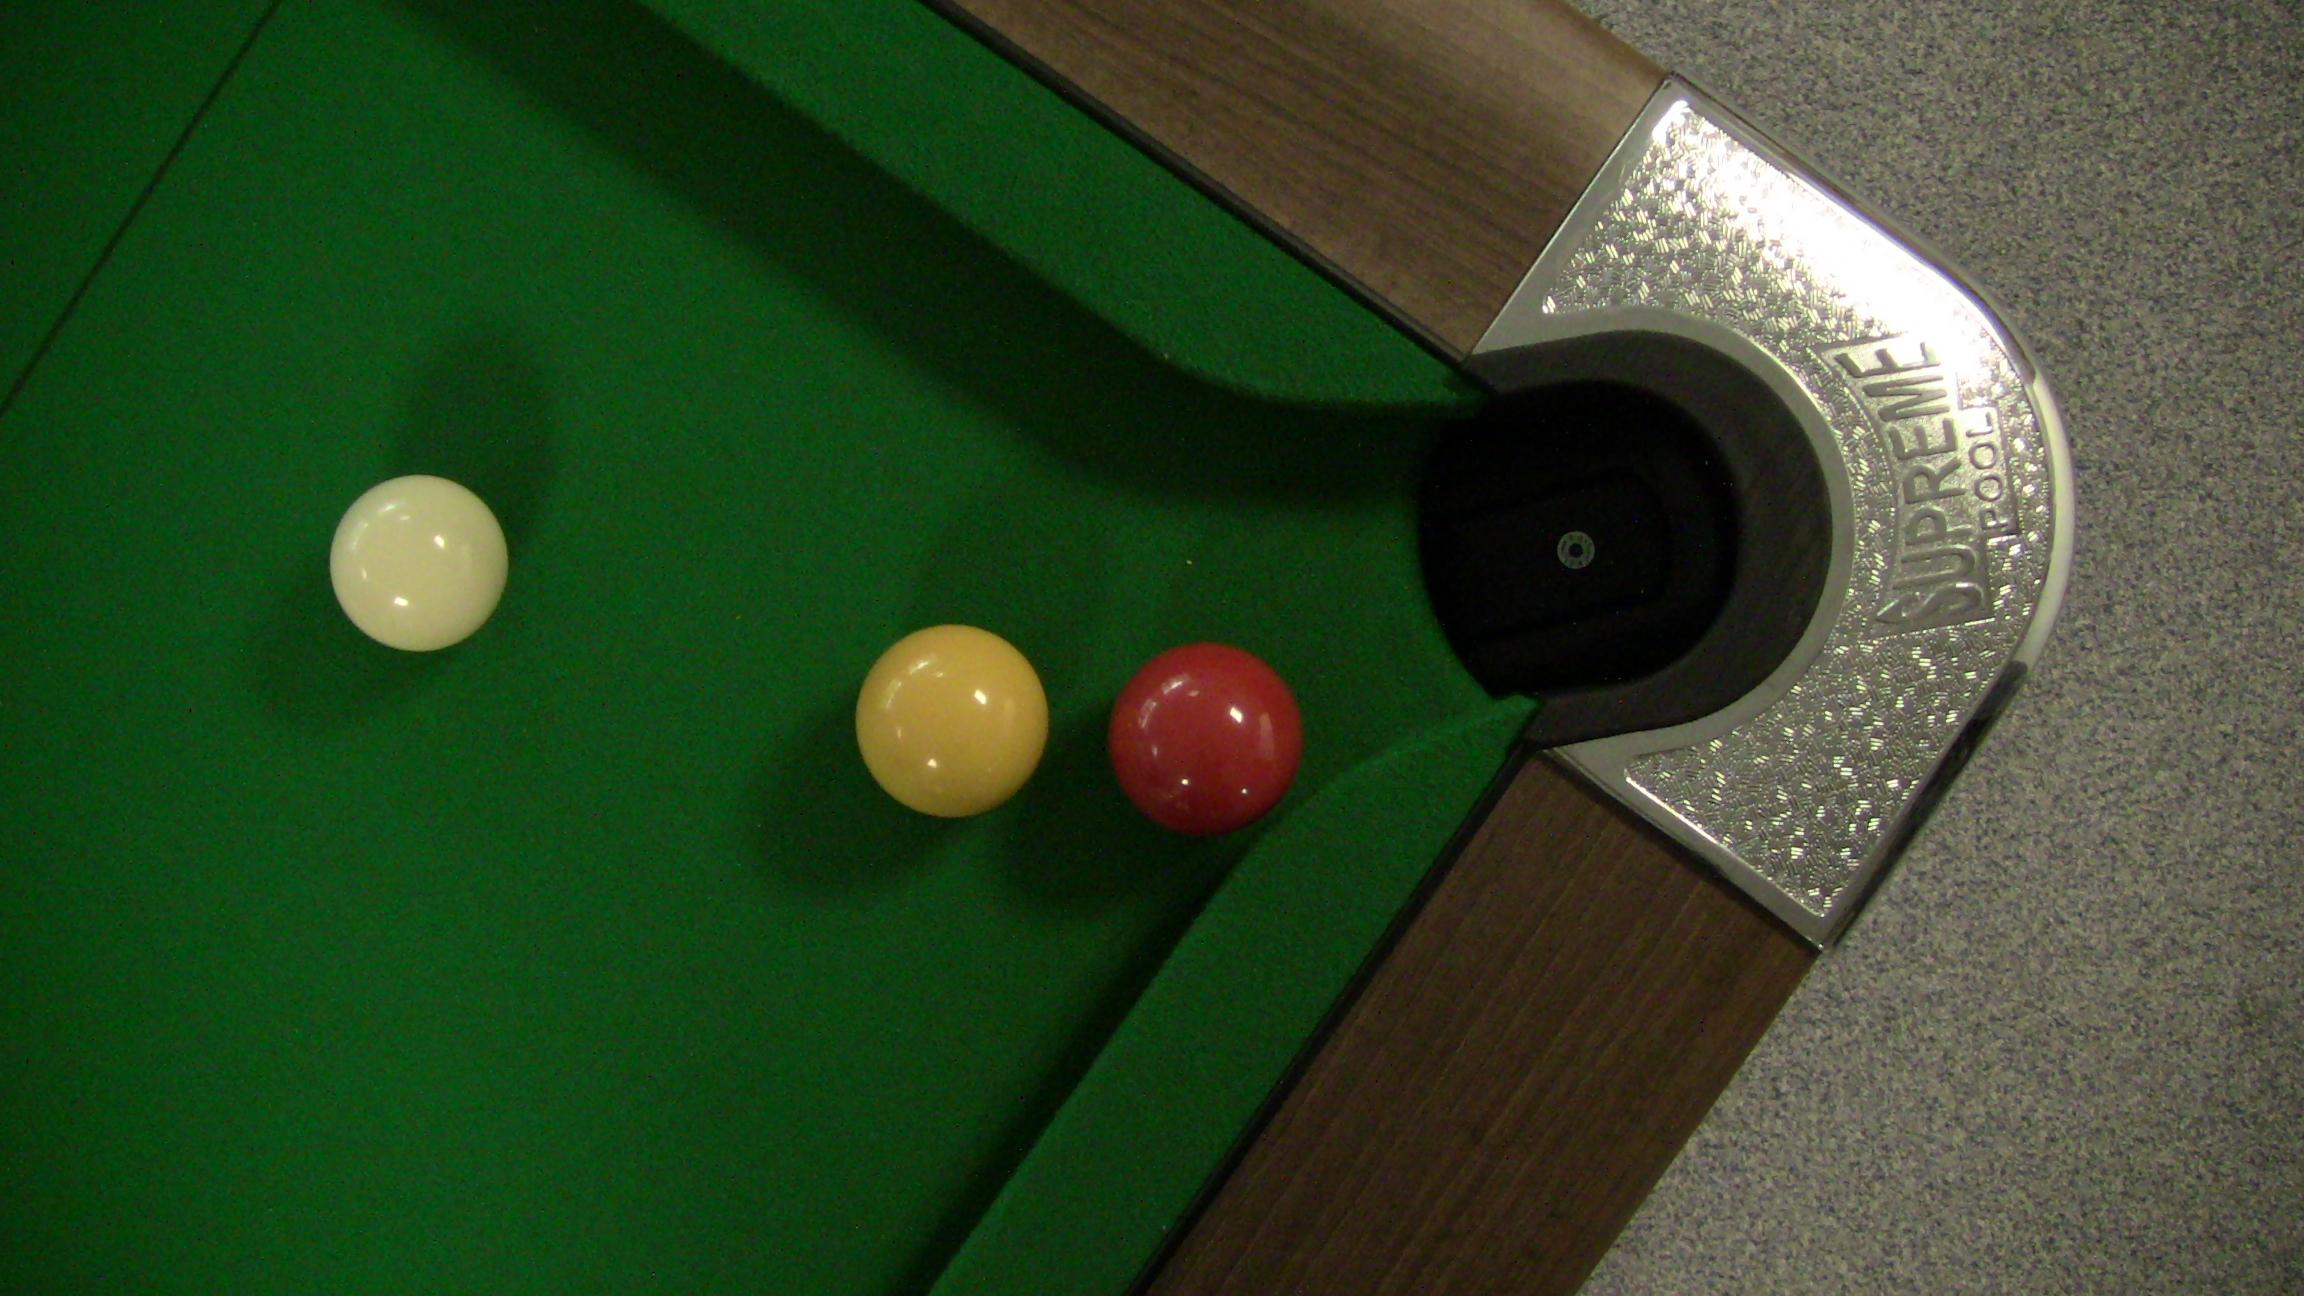 Brunswick Billiard Tables Bars Game Rooms Huntington Station Ny